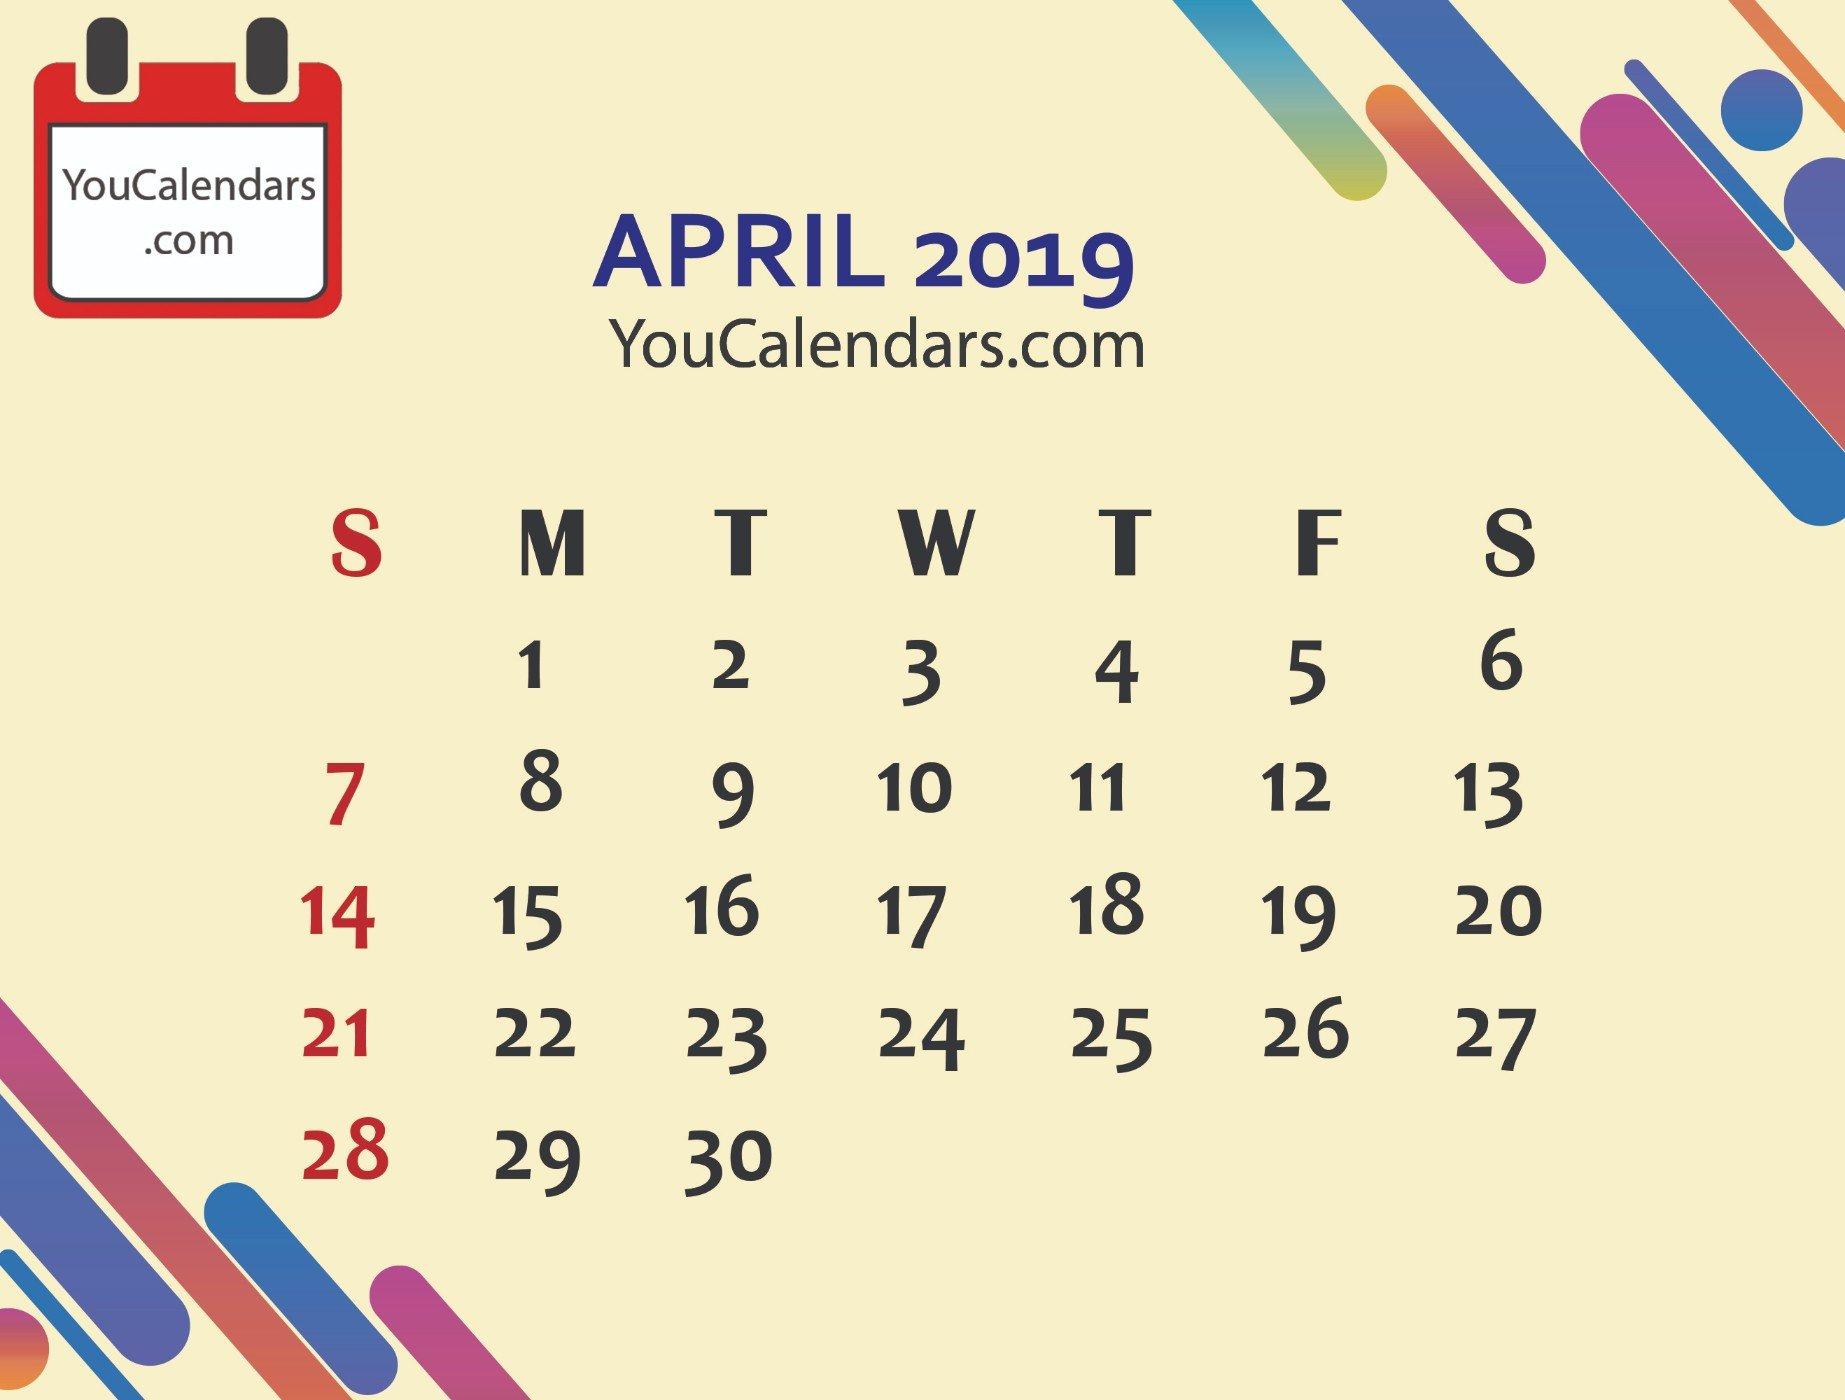 ✅Free April 2019 Calendar Printable Template – You Calendars April 8 2019 Calendar